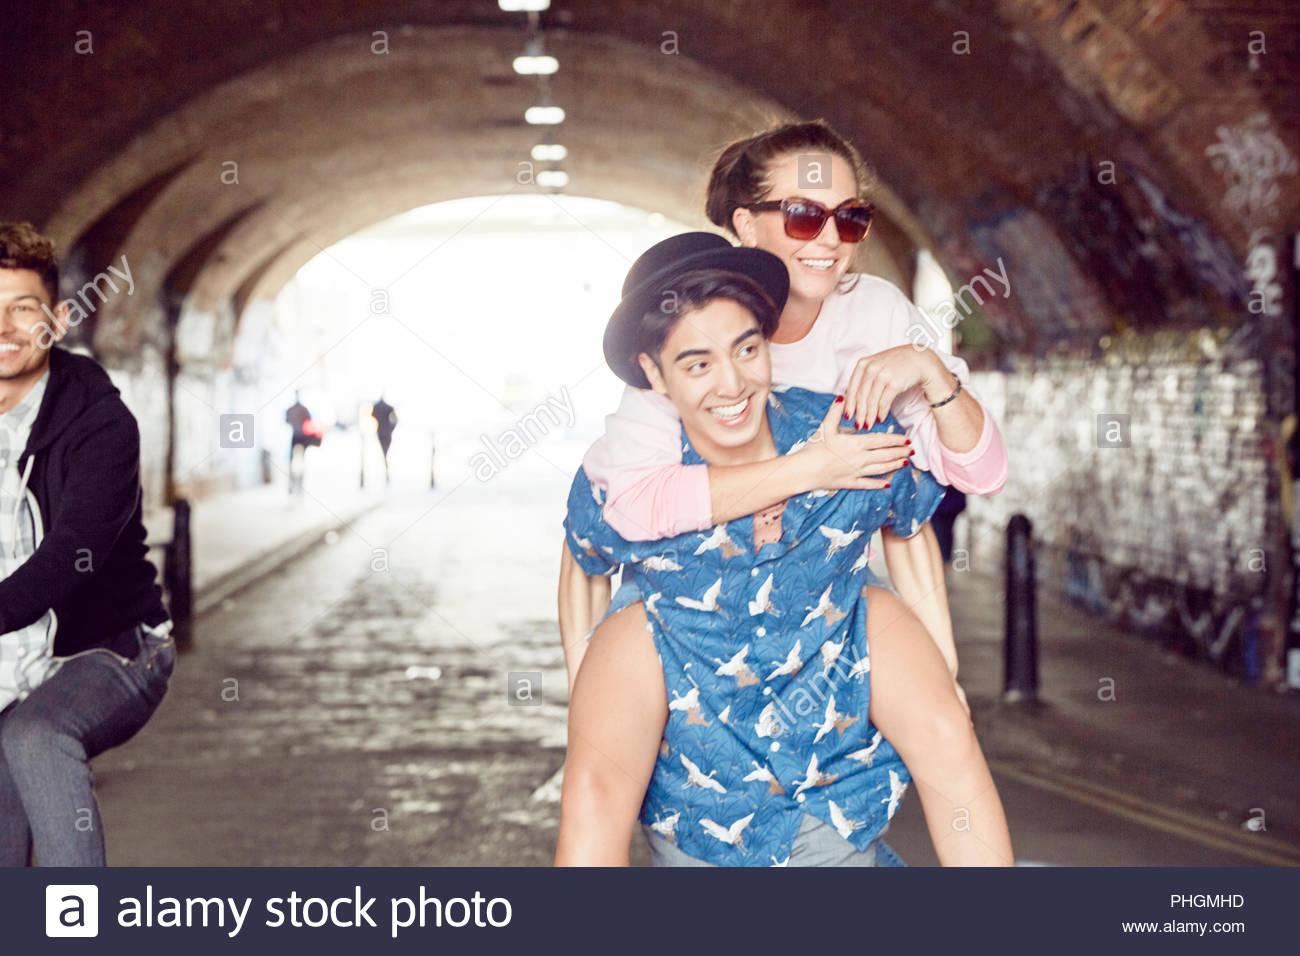 Teenage boy giving girlfriend piggyback ride in tunnel Photo Stock